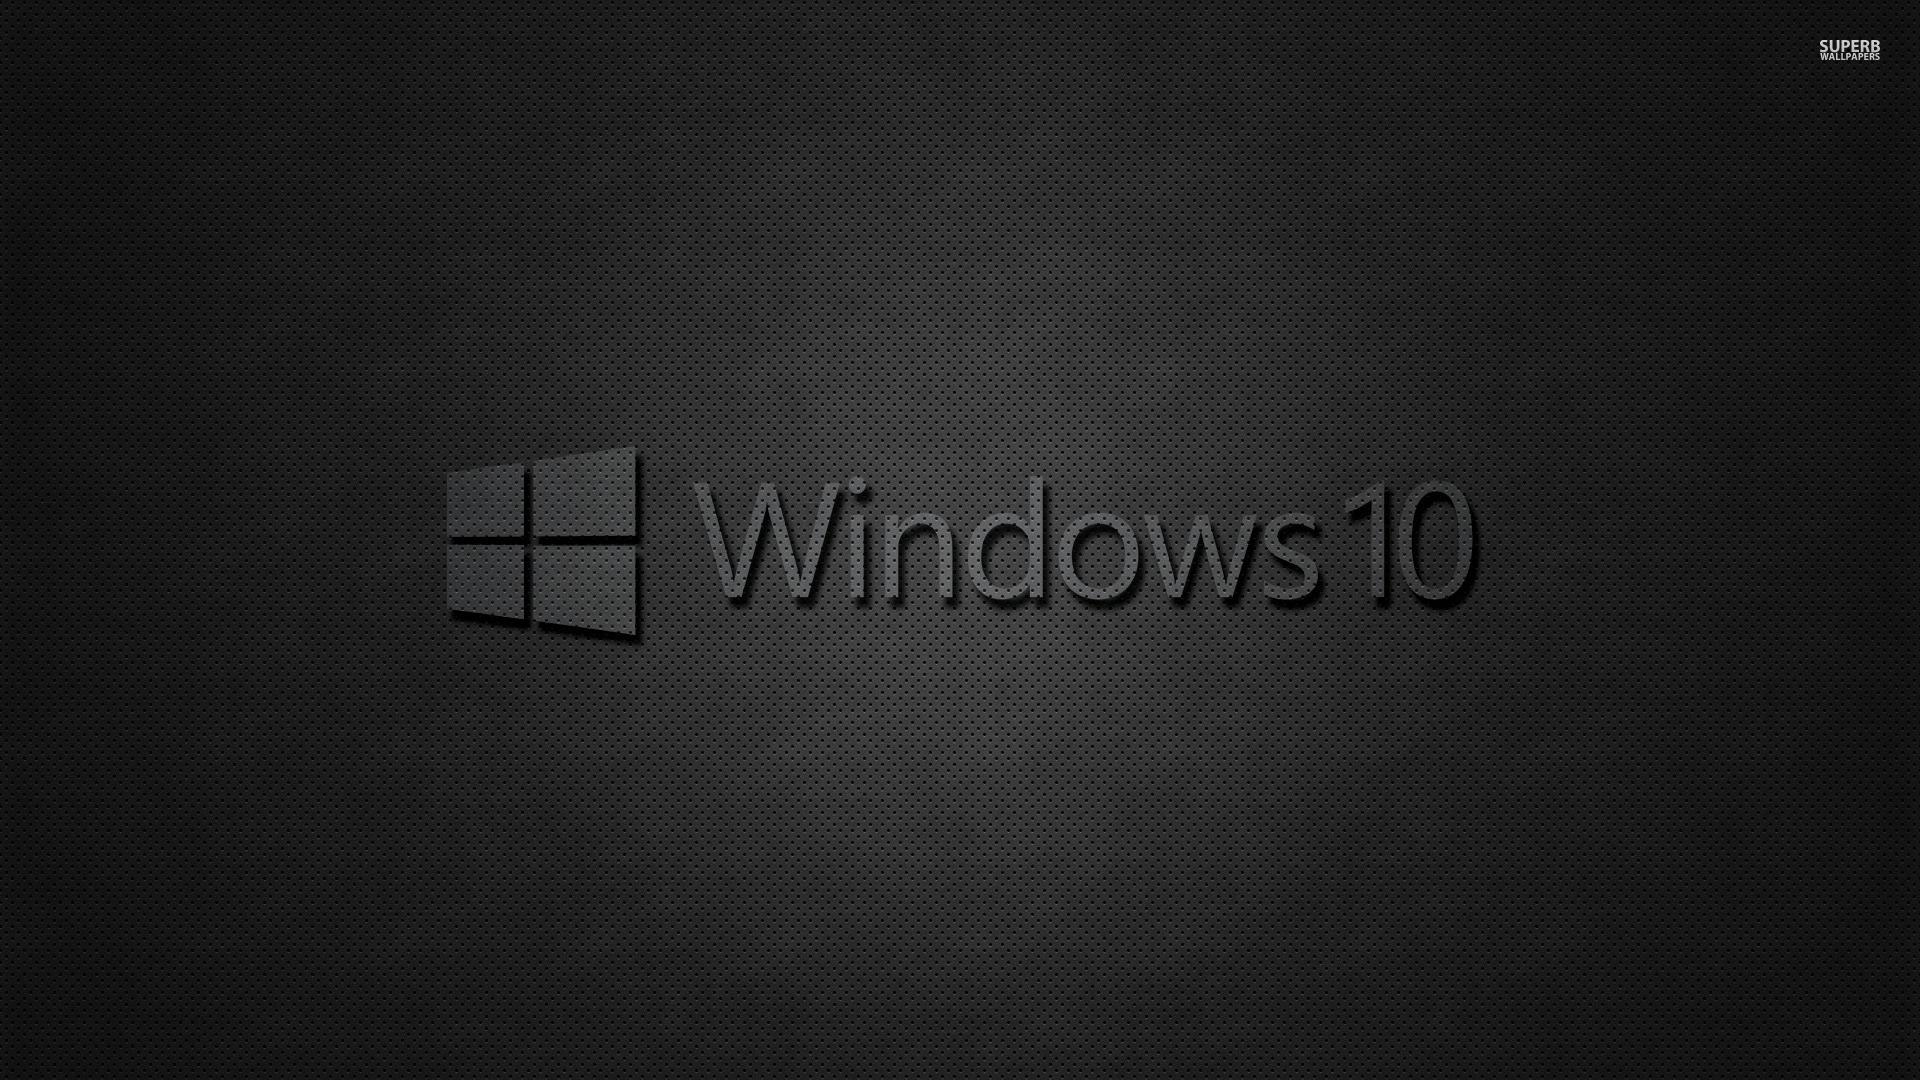 Black Windows Wallpaper 1080p: Dark Windows 10 Wallpapers